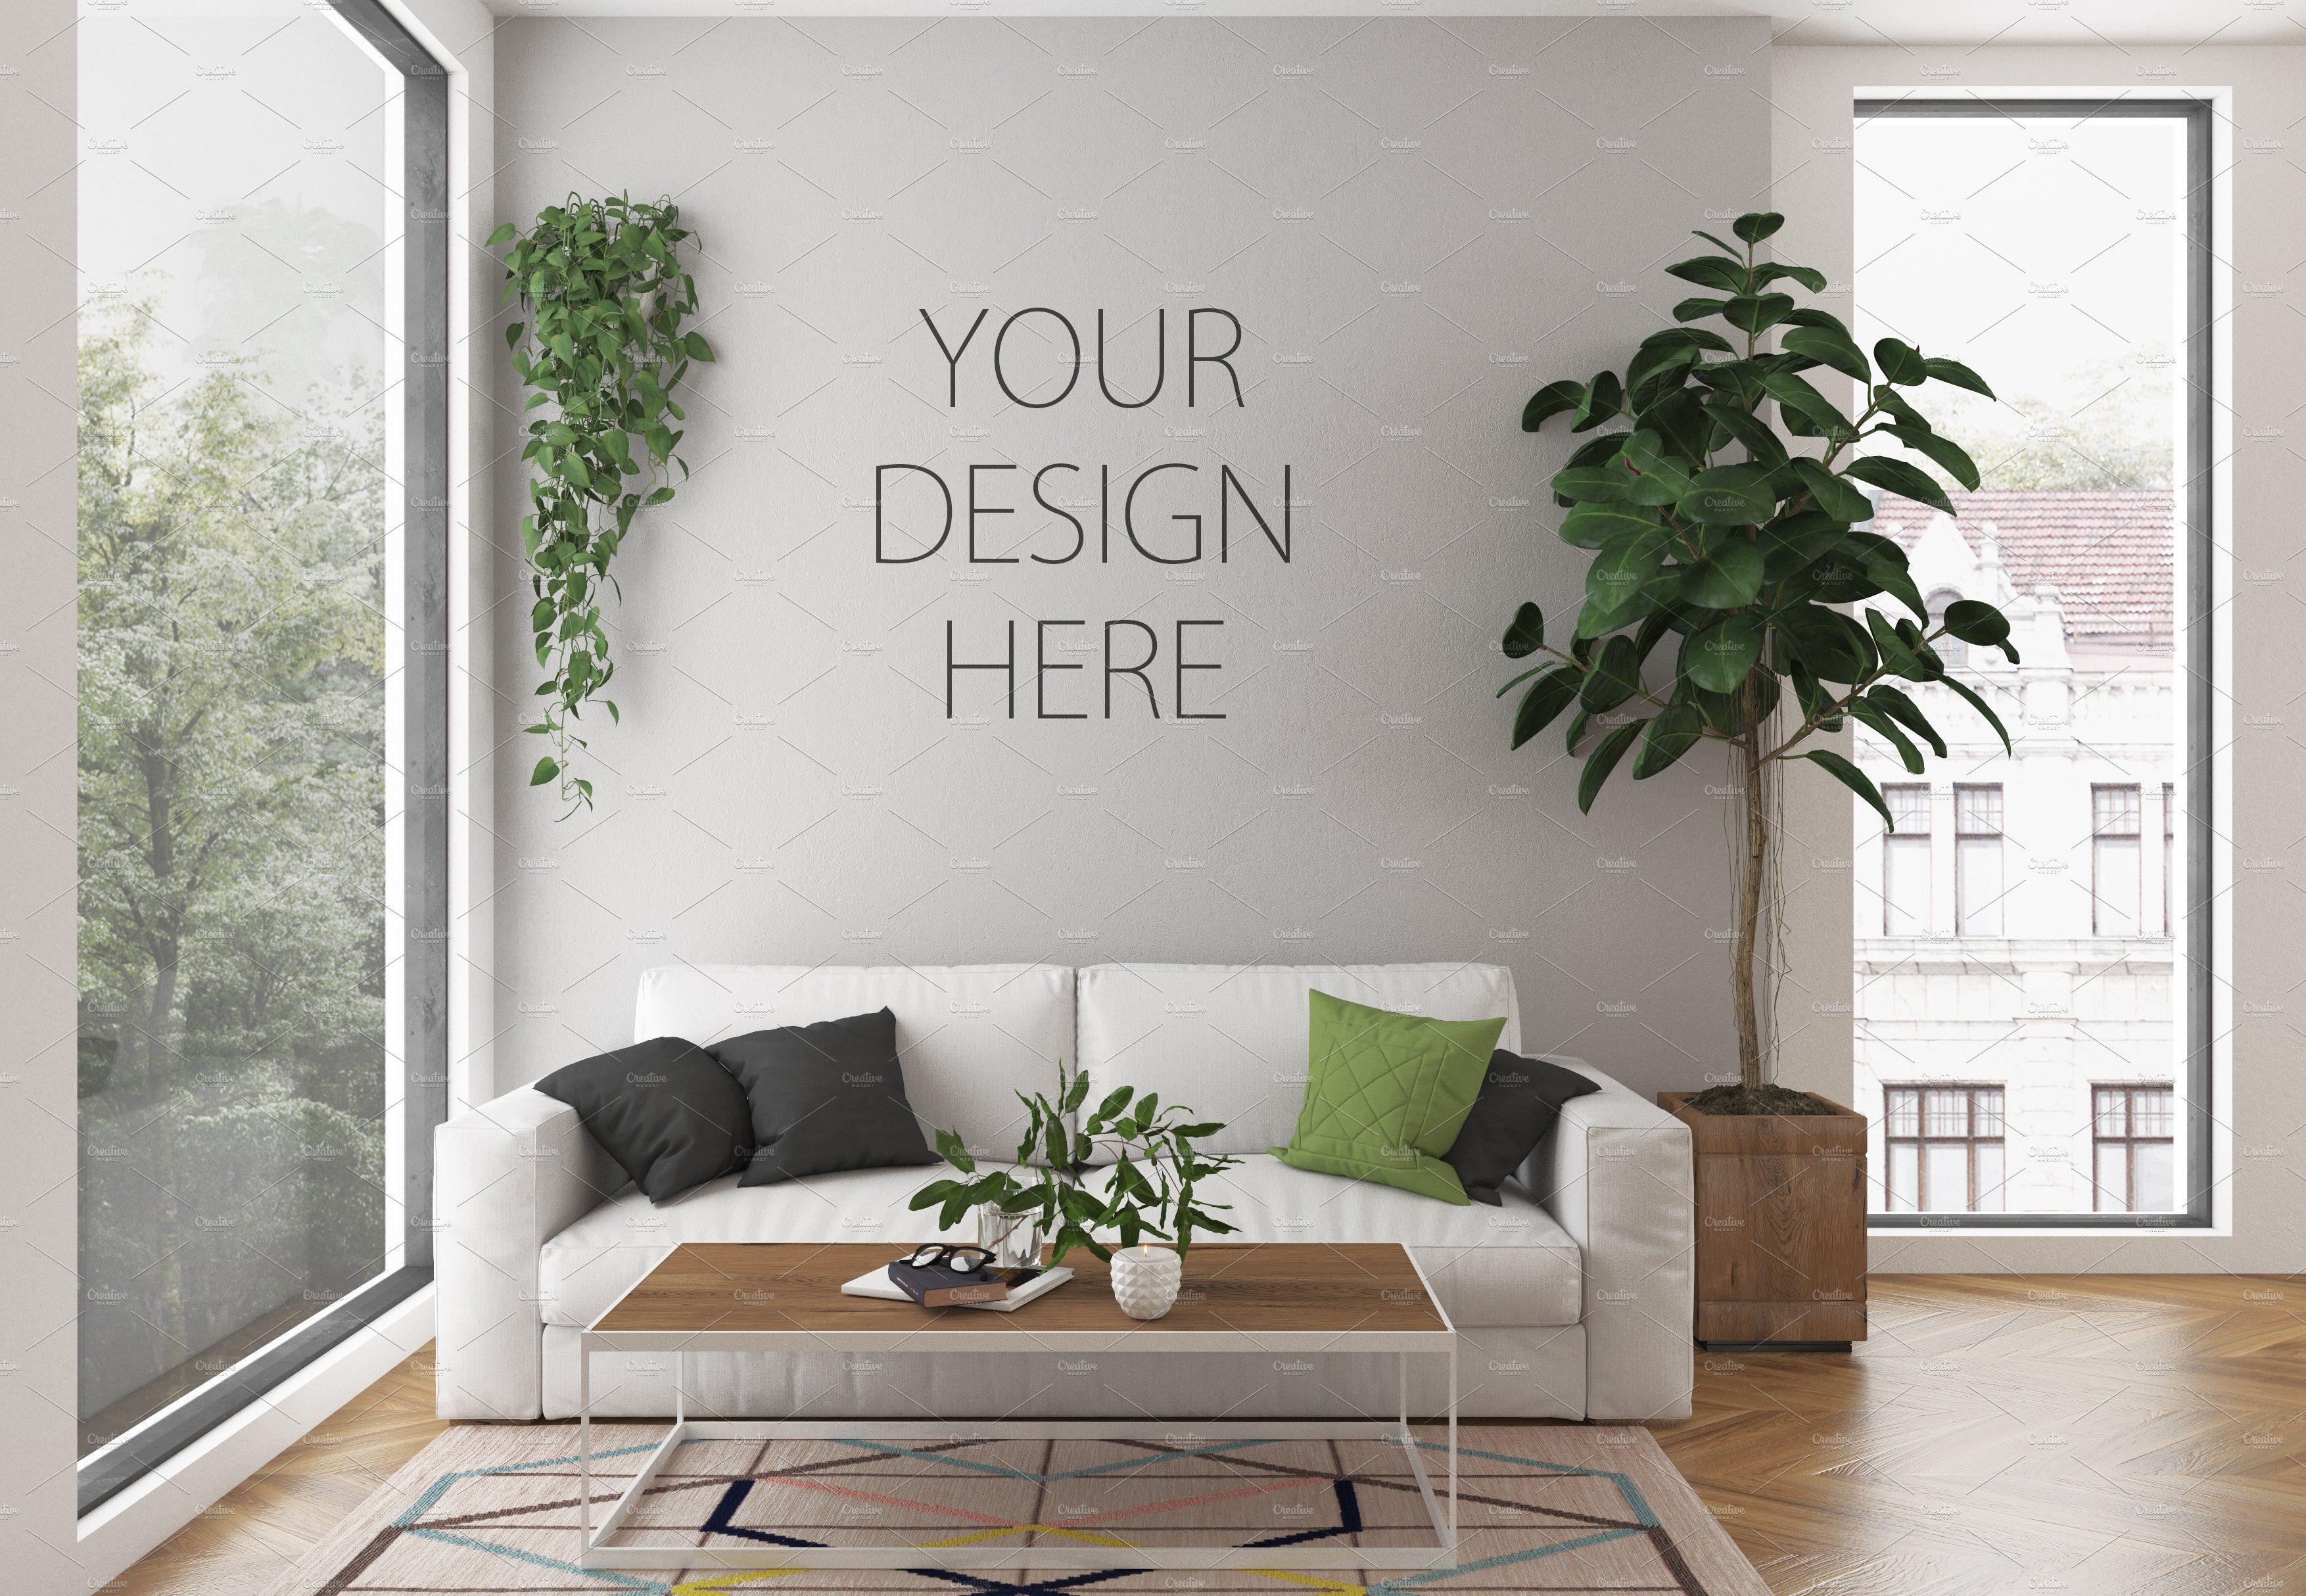 Interior Mockup Artwork Background Mockup Free Psd Free Psd Mockups Templates Design Mockup Free